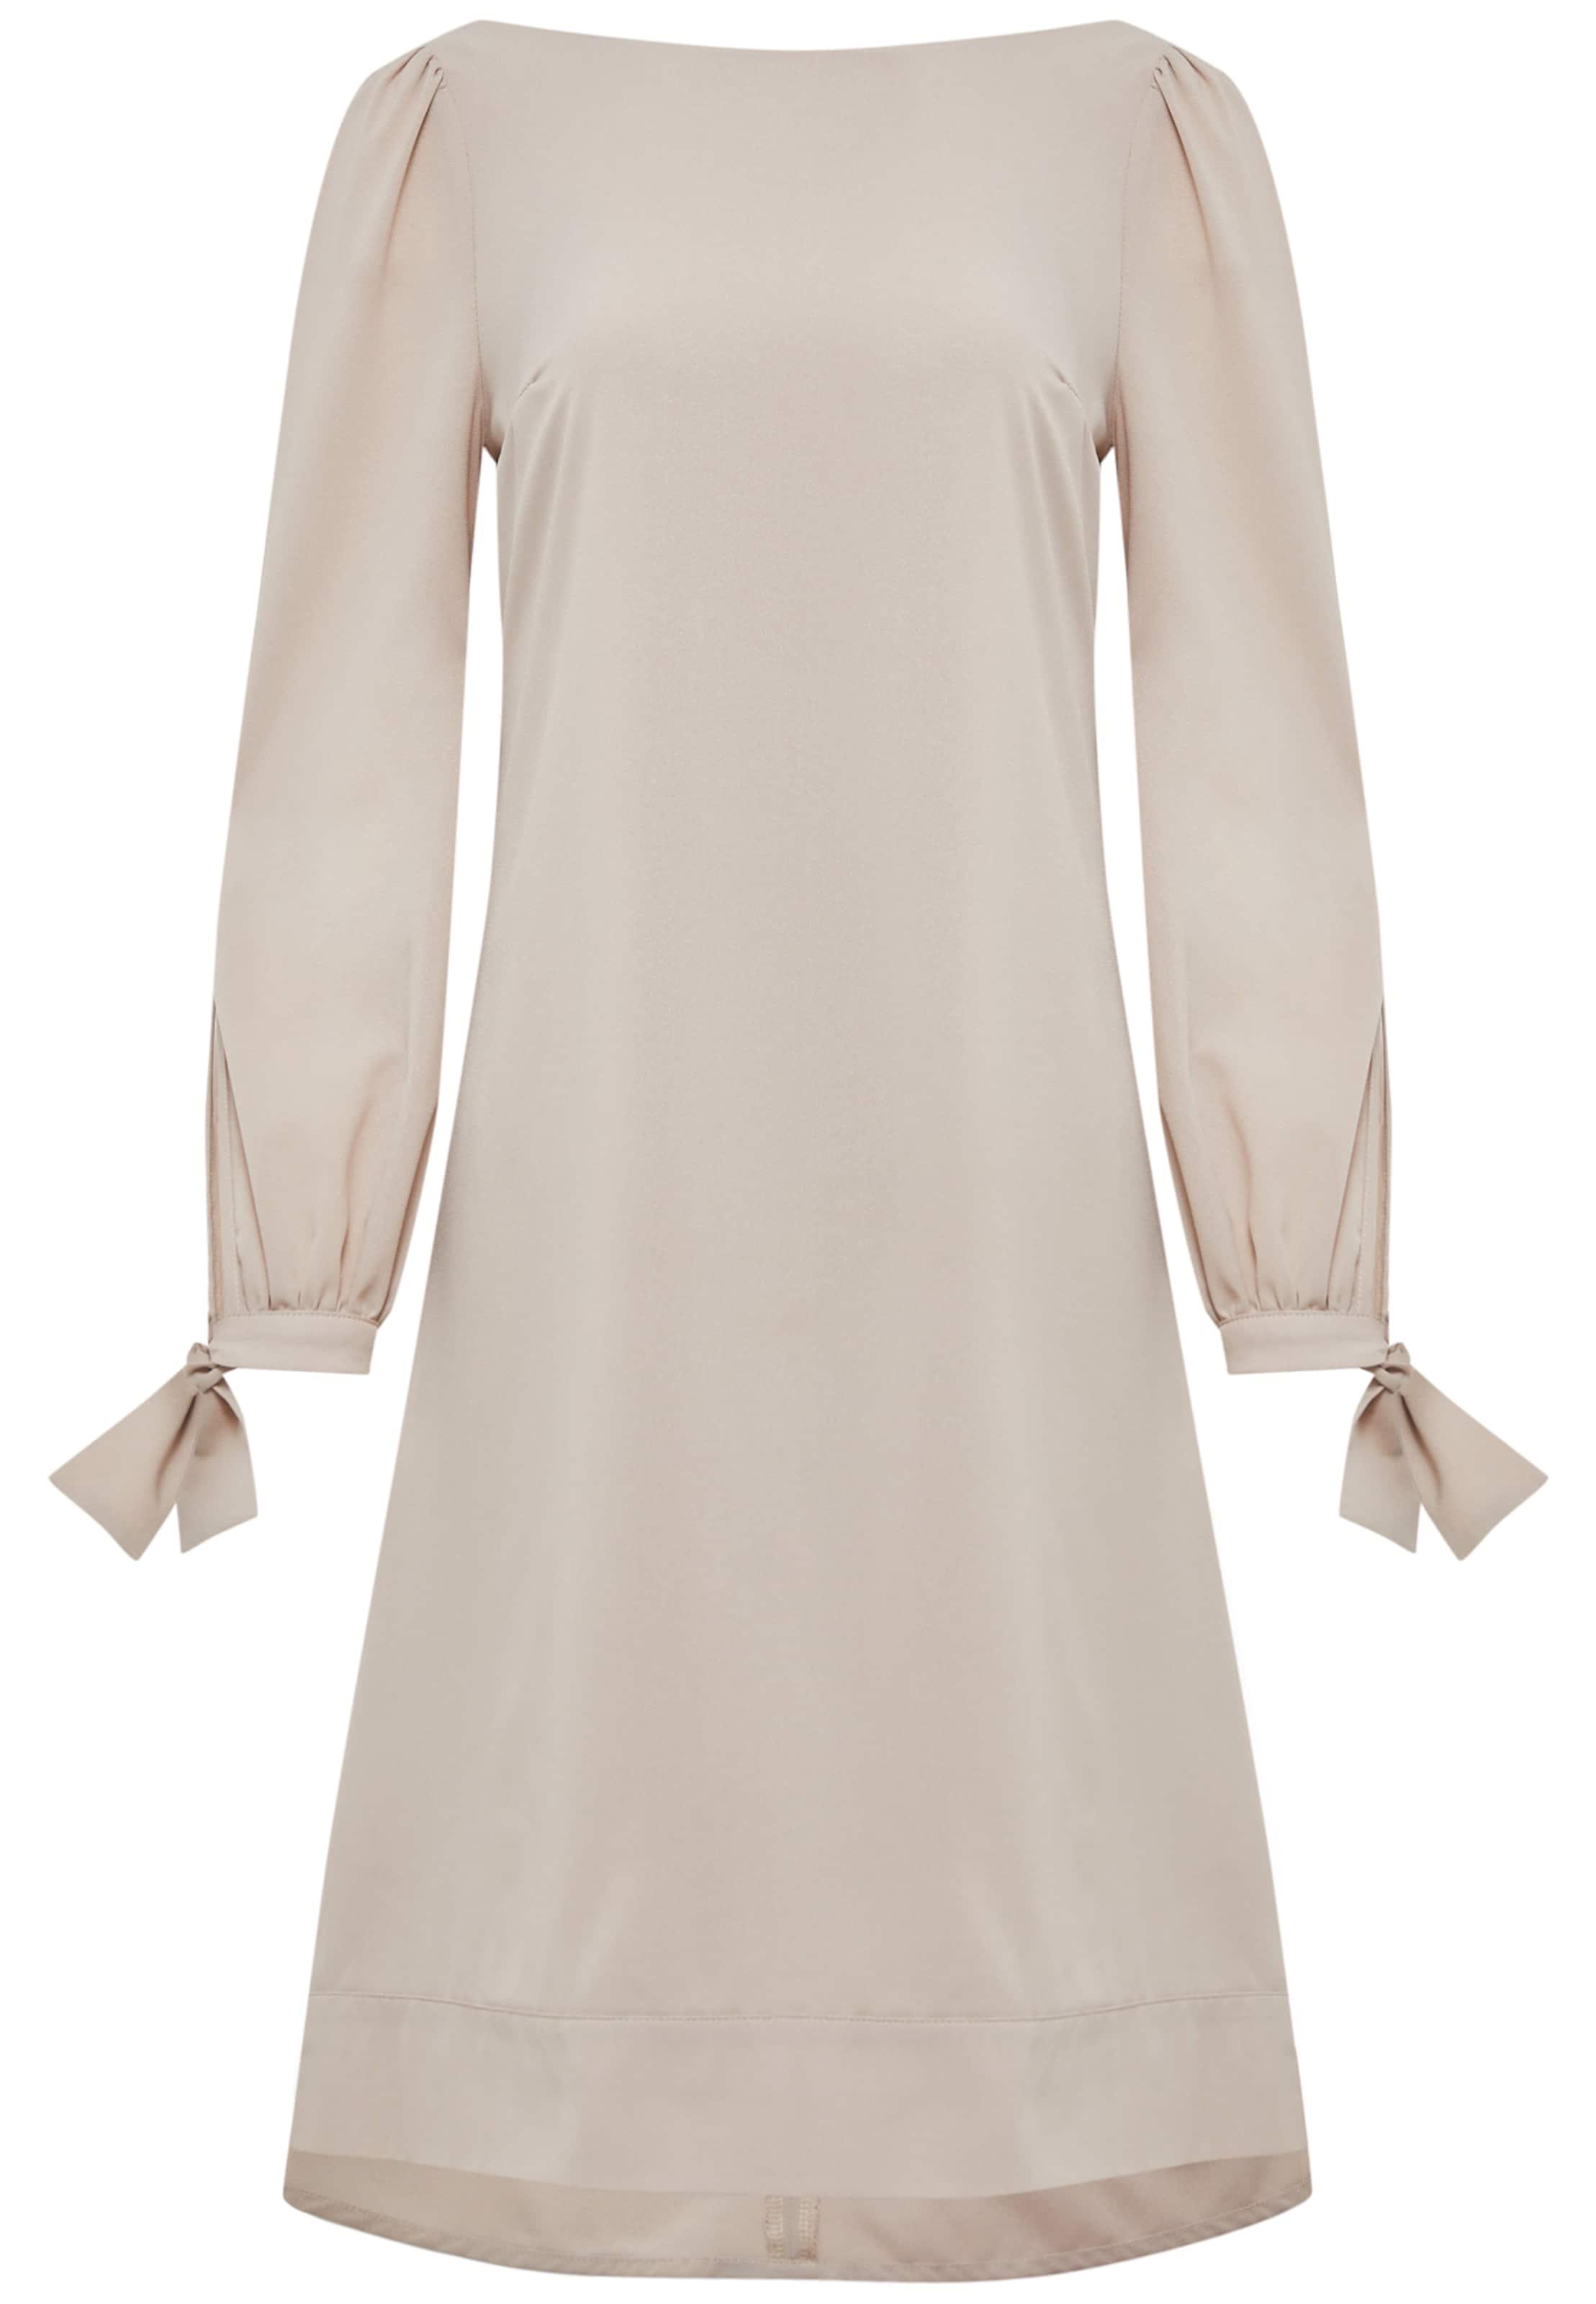 Kleid In Beige Faina Kleid In Faina Faina Beige In Kleid cAL354jqR